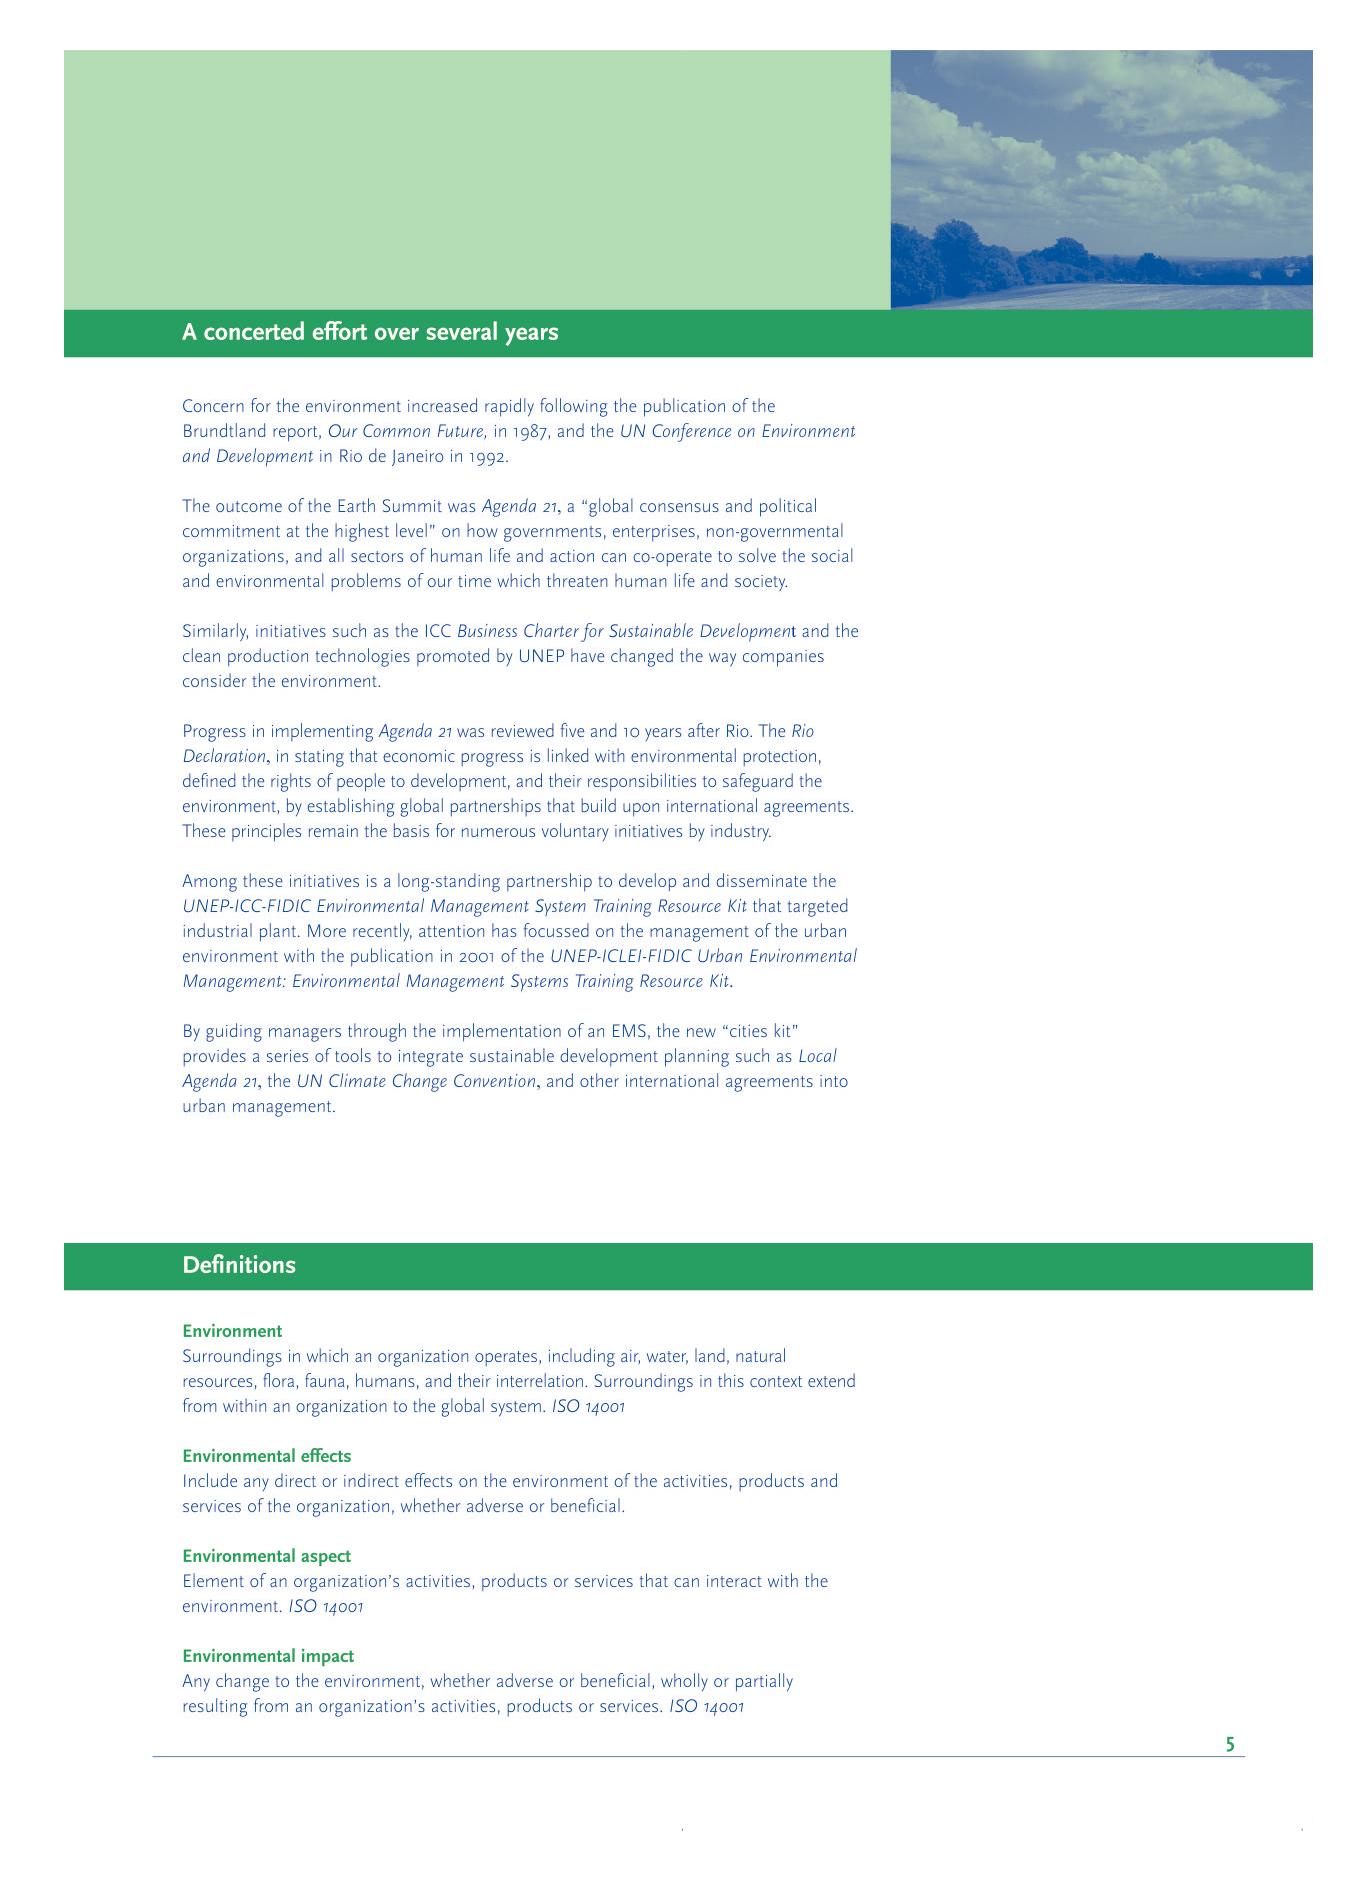 Ems Environmental Management System Training Resource Kit